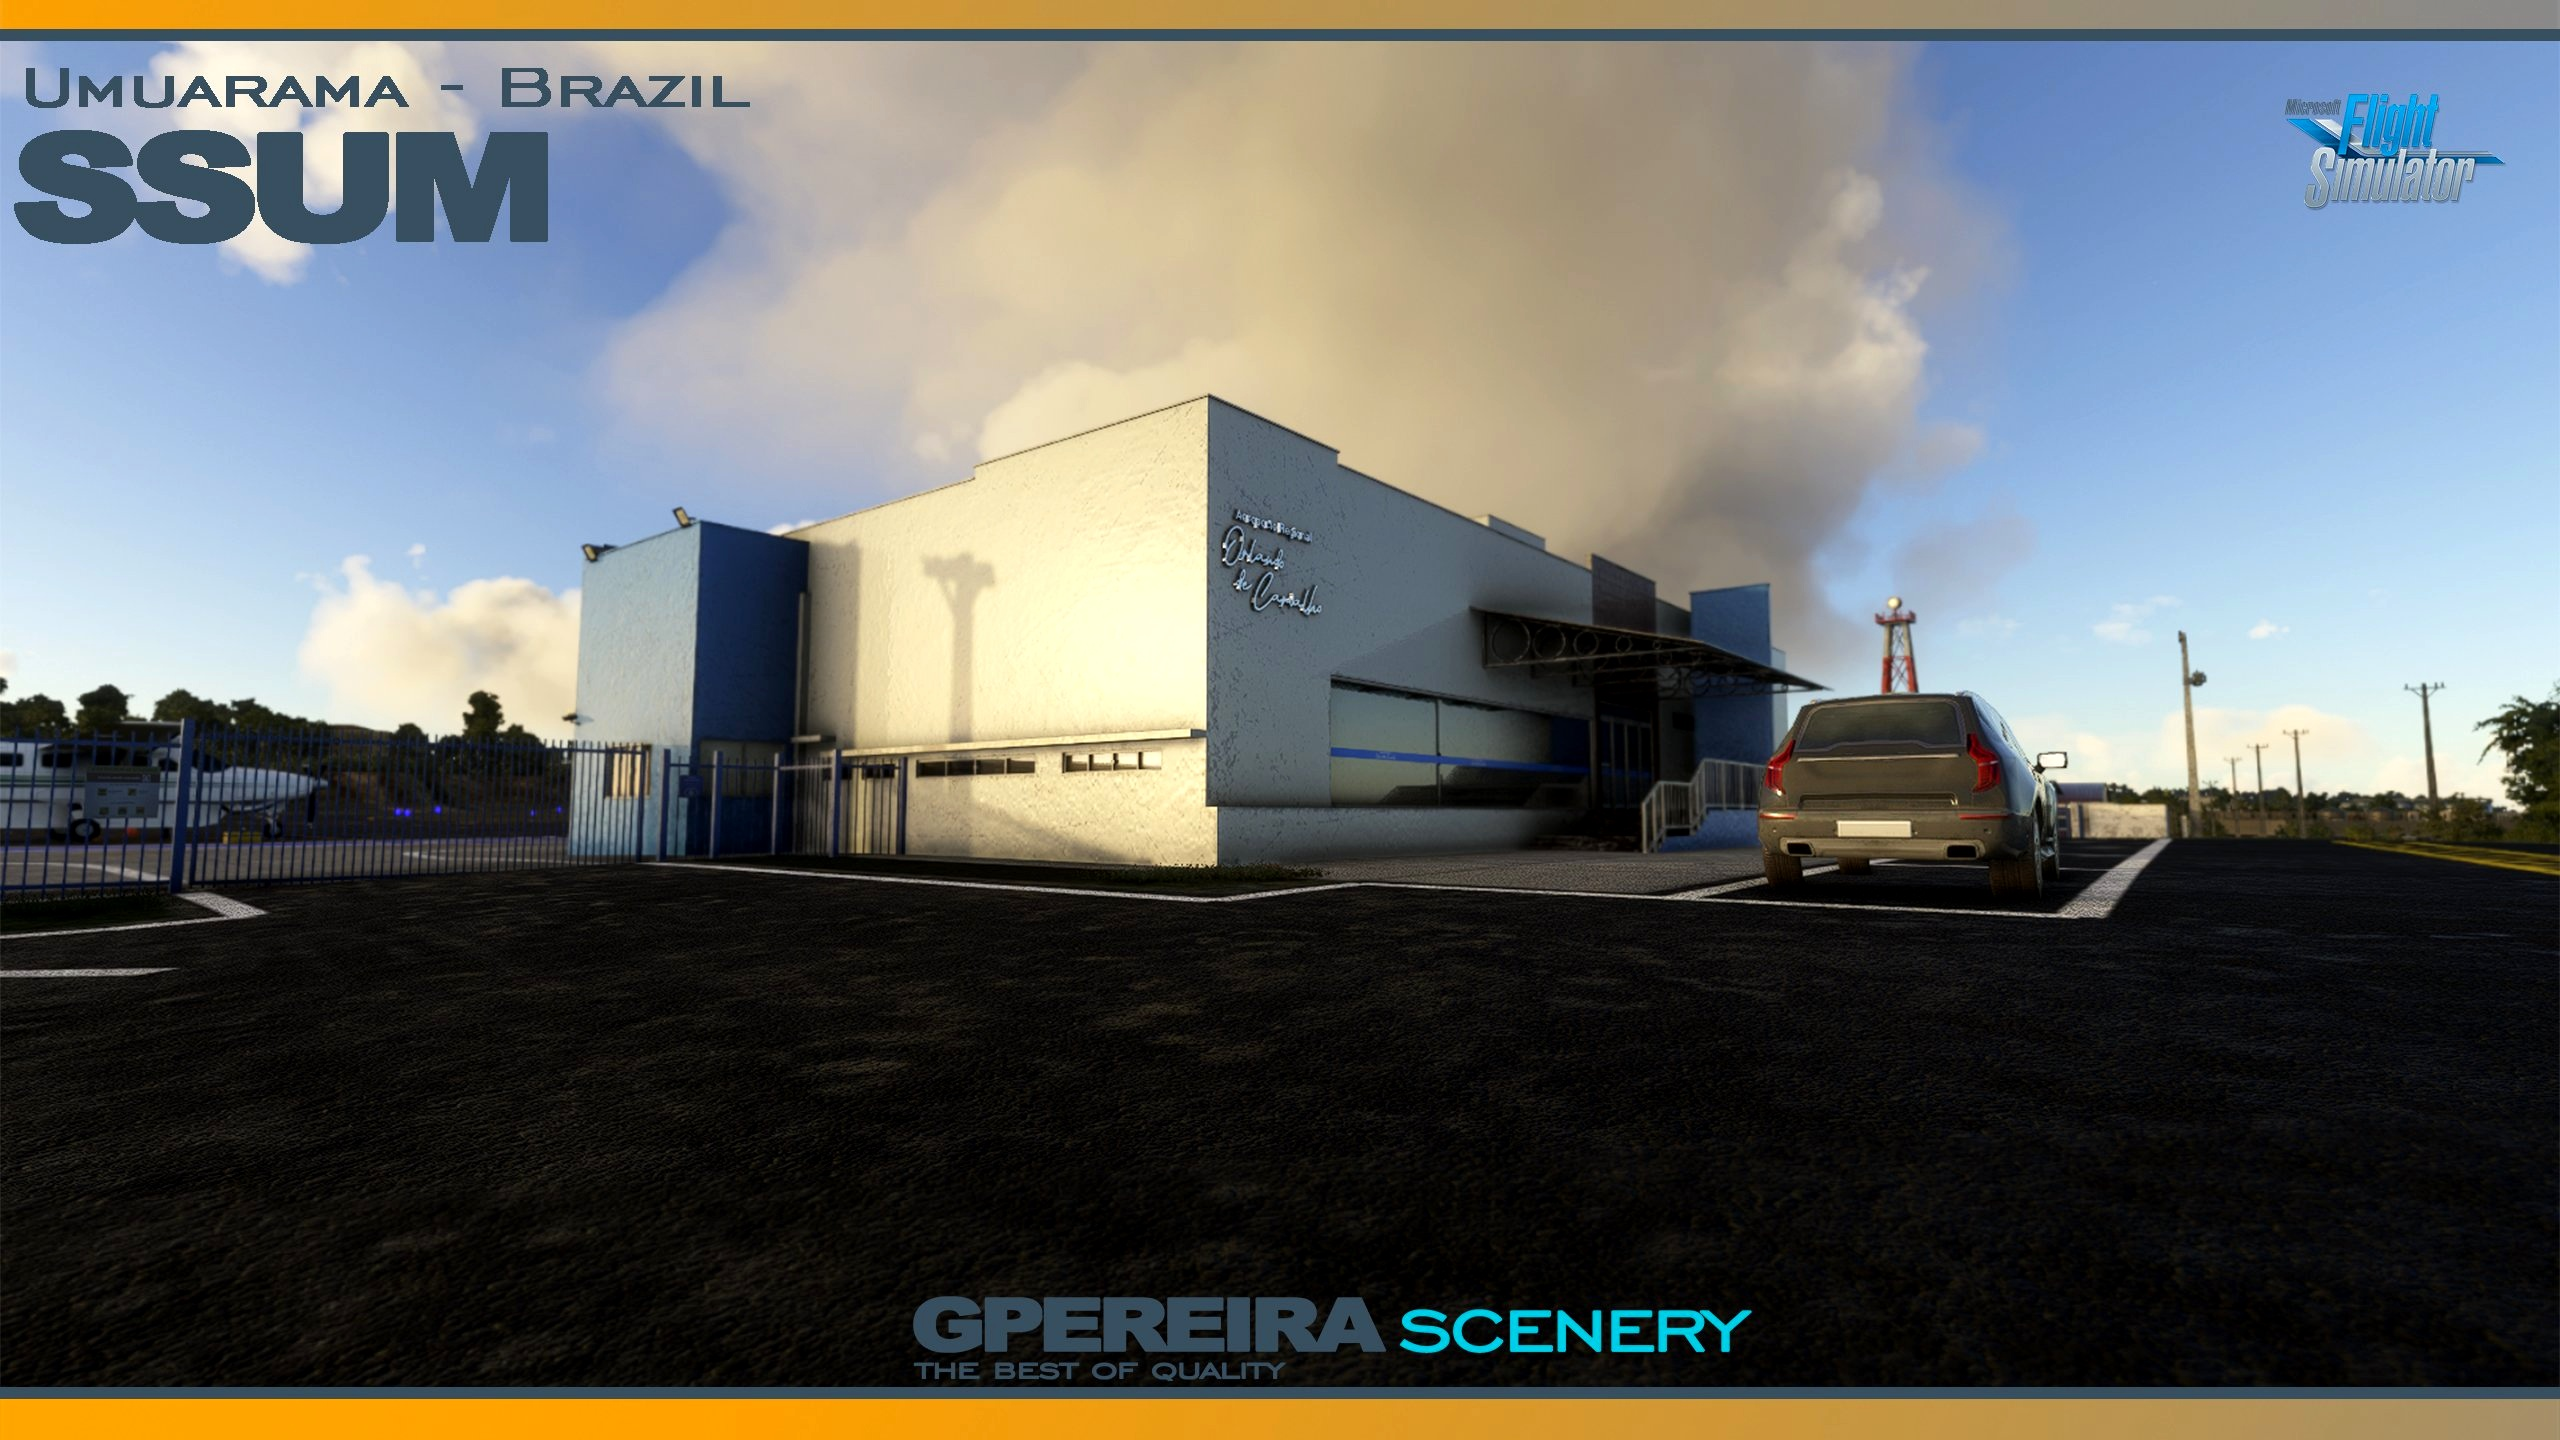 GPEREIRA SCENERY - UMUARAMA - SSUM - BRAZIL - MSFS Microsoft Flight Simulator